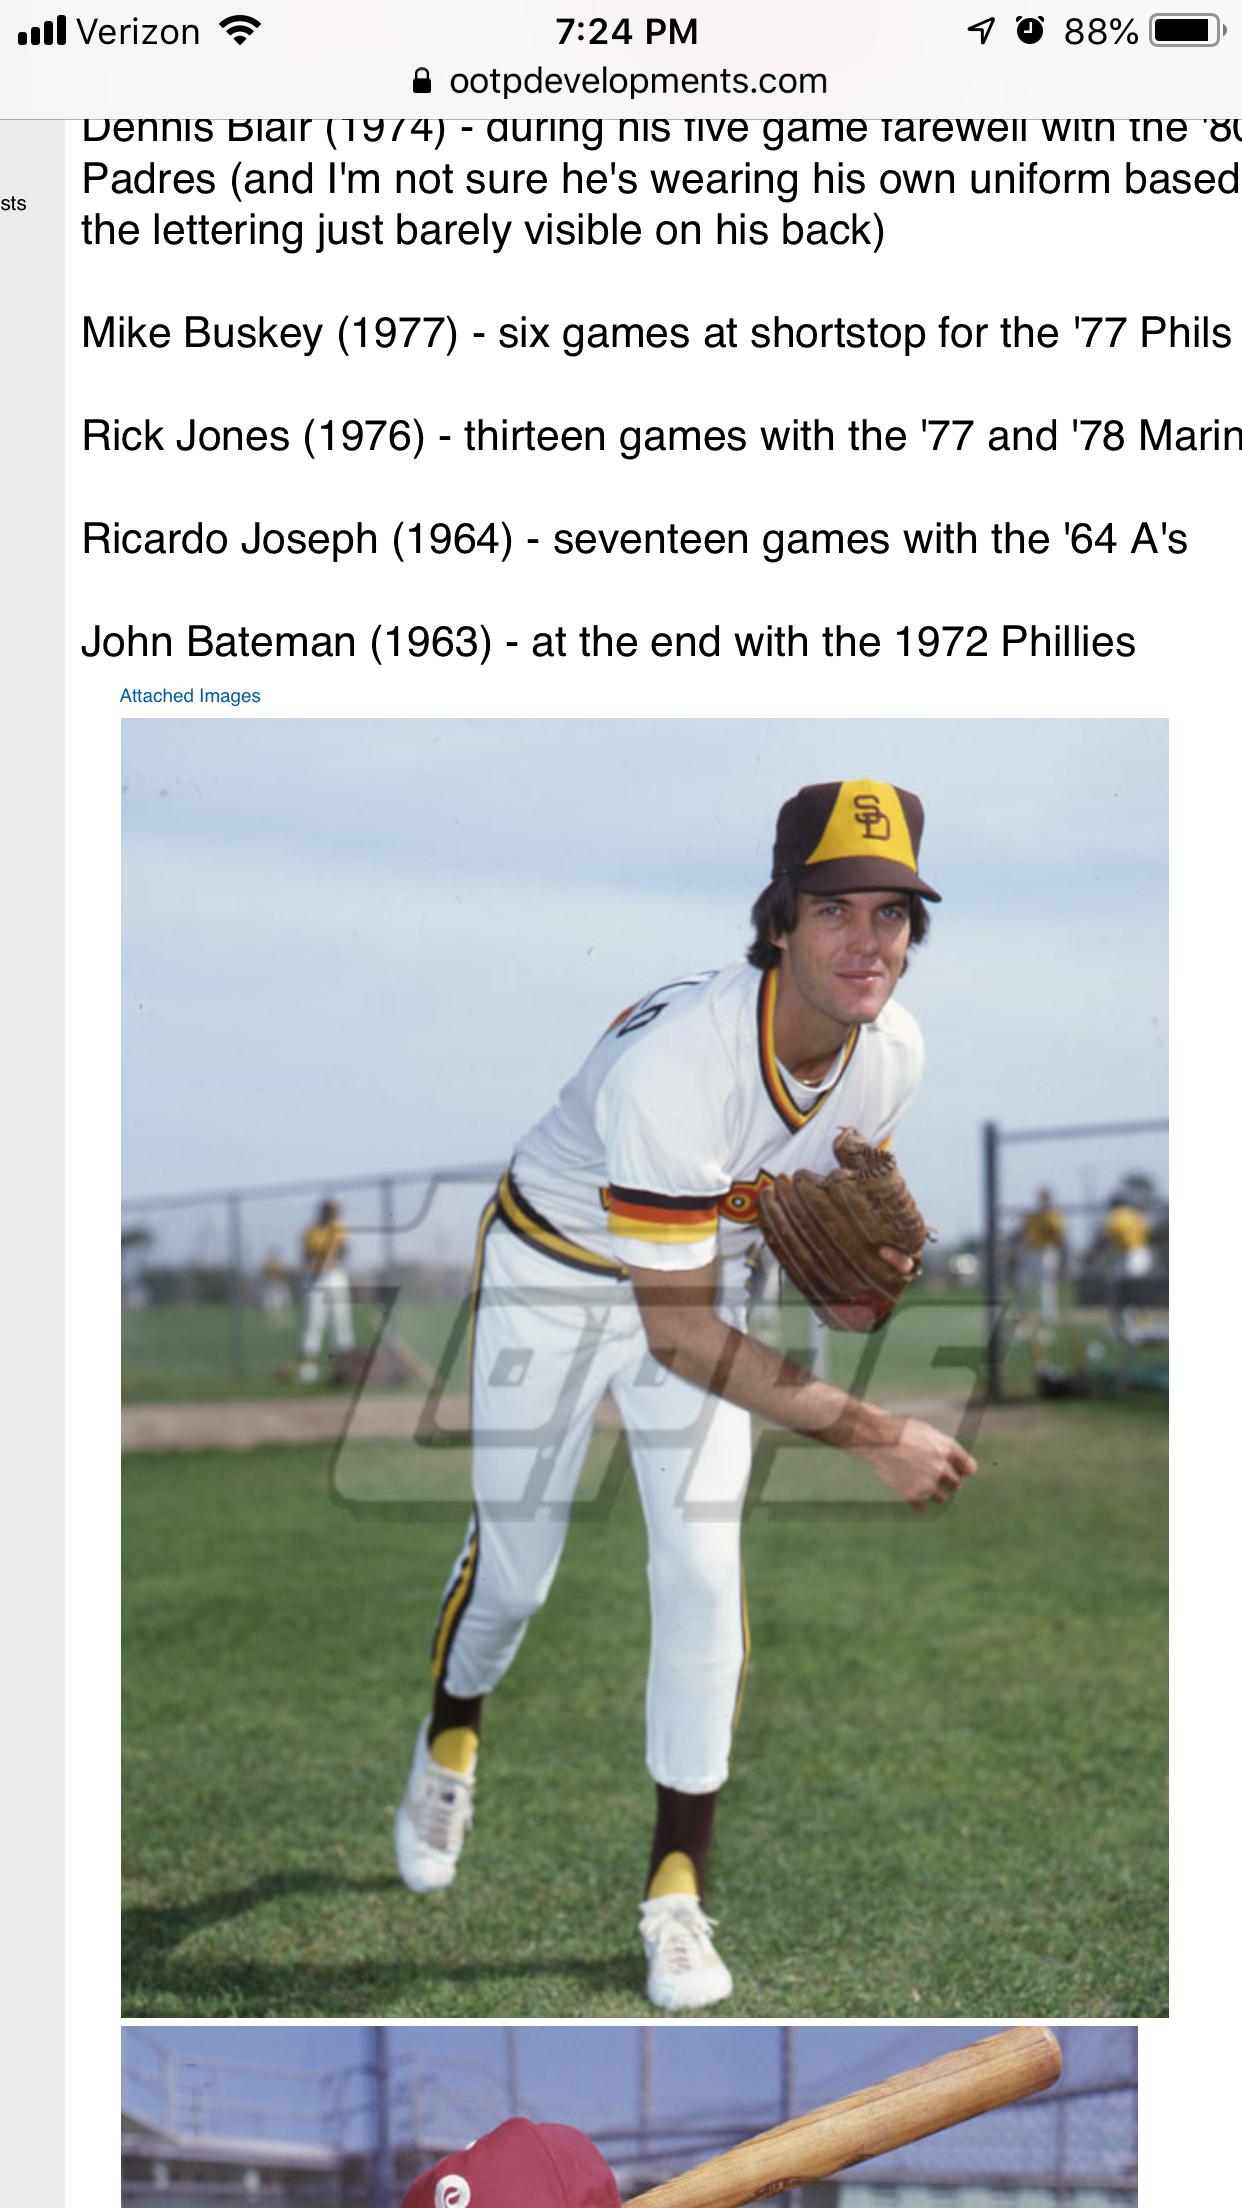 Pin by Brandon Bowles on The Swinging Friars Baseball